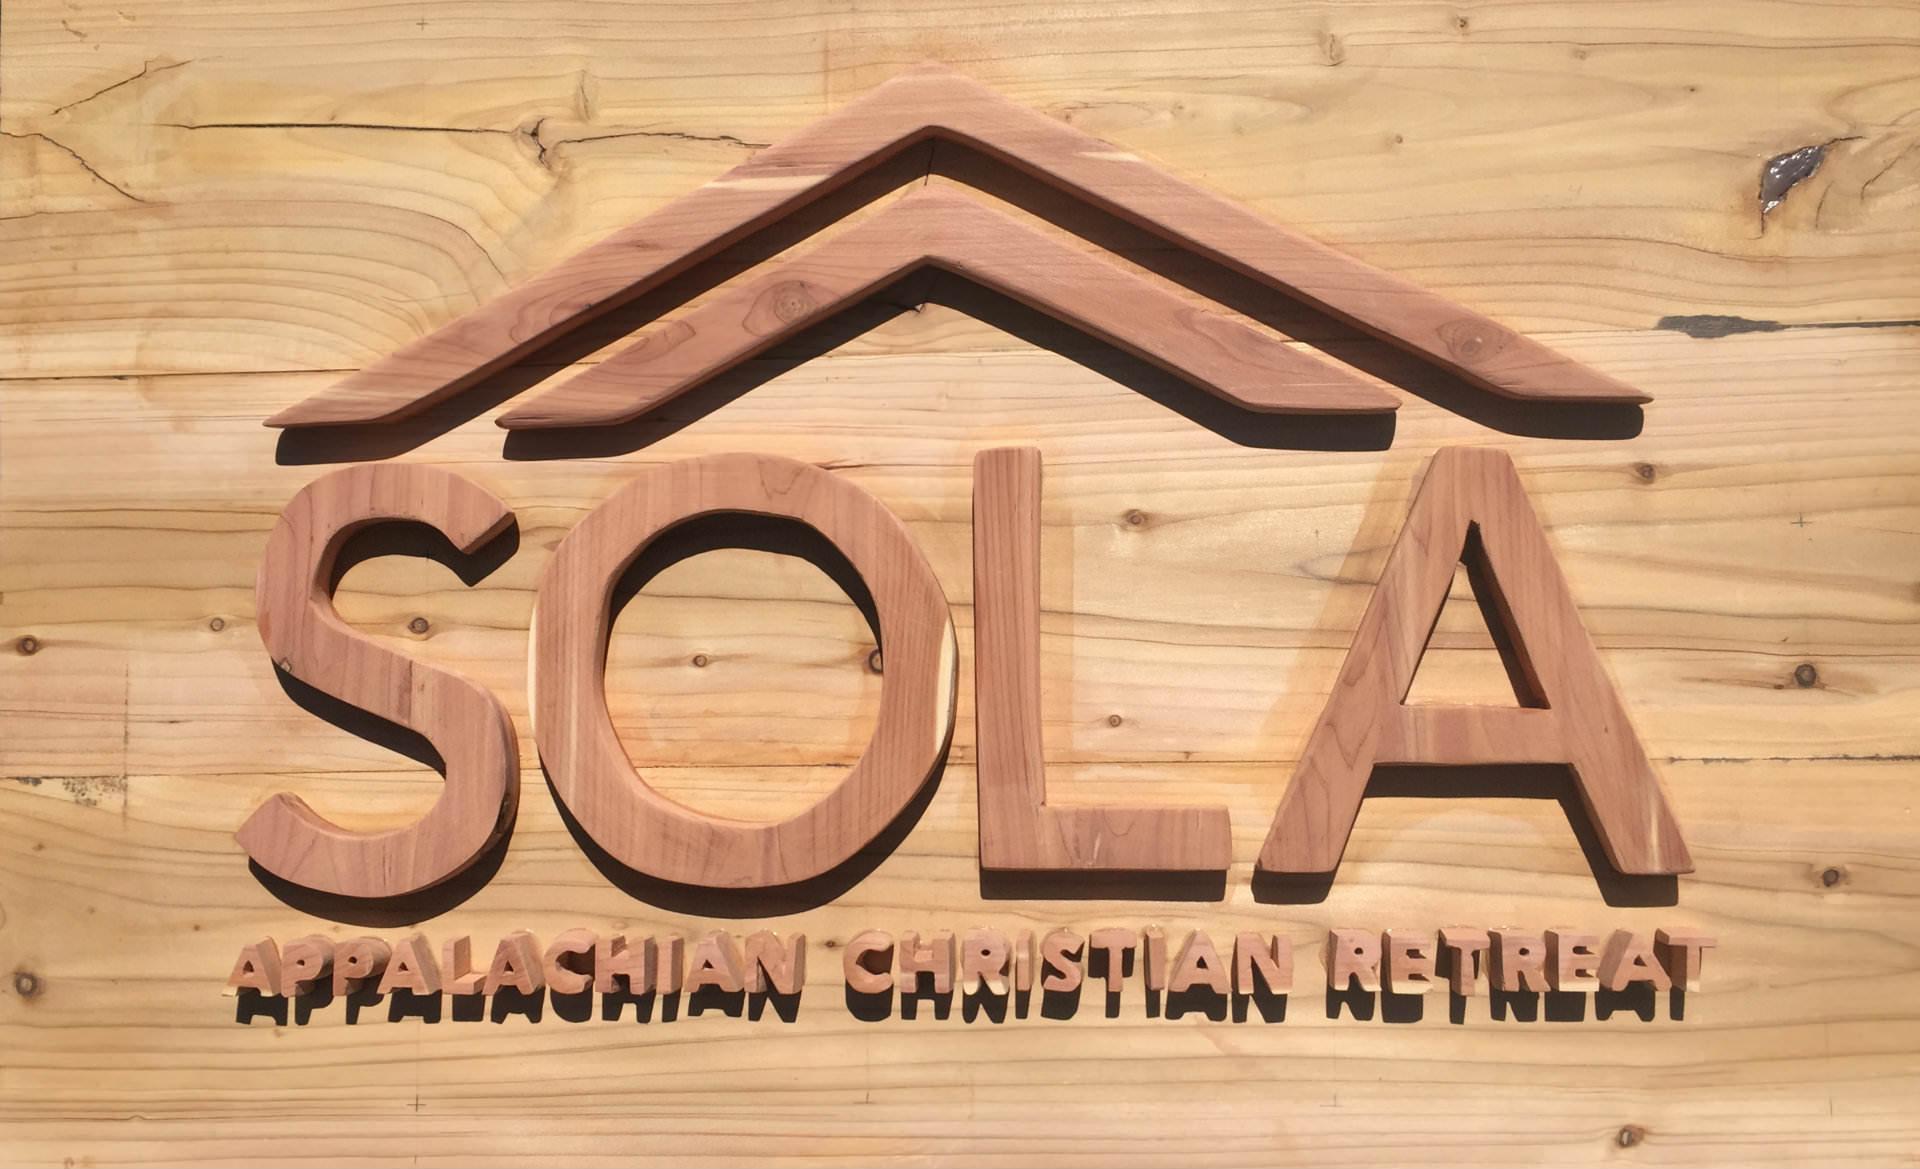 Sola Appalachian Christian Retreat